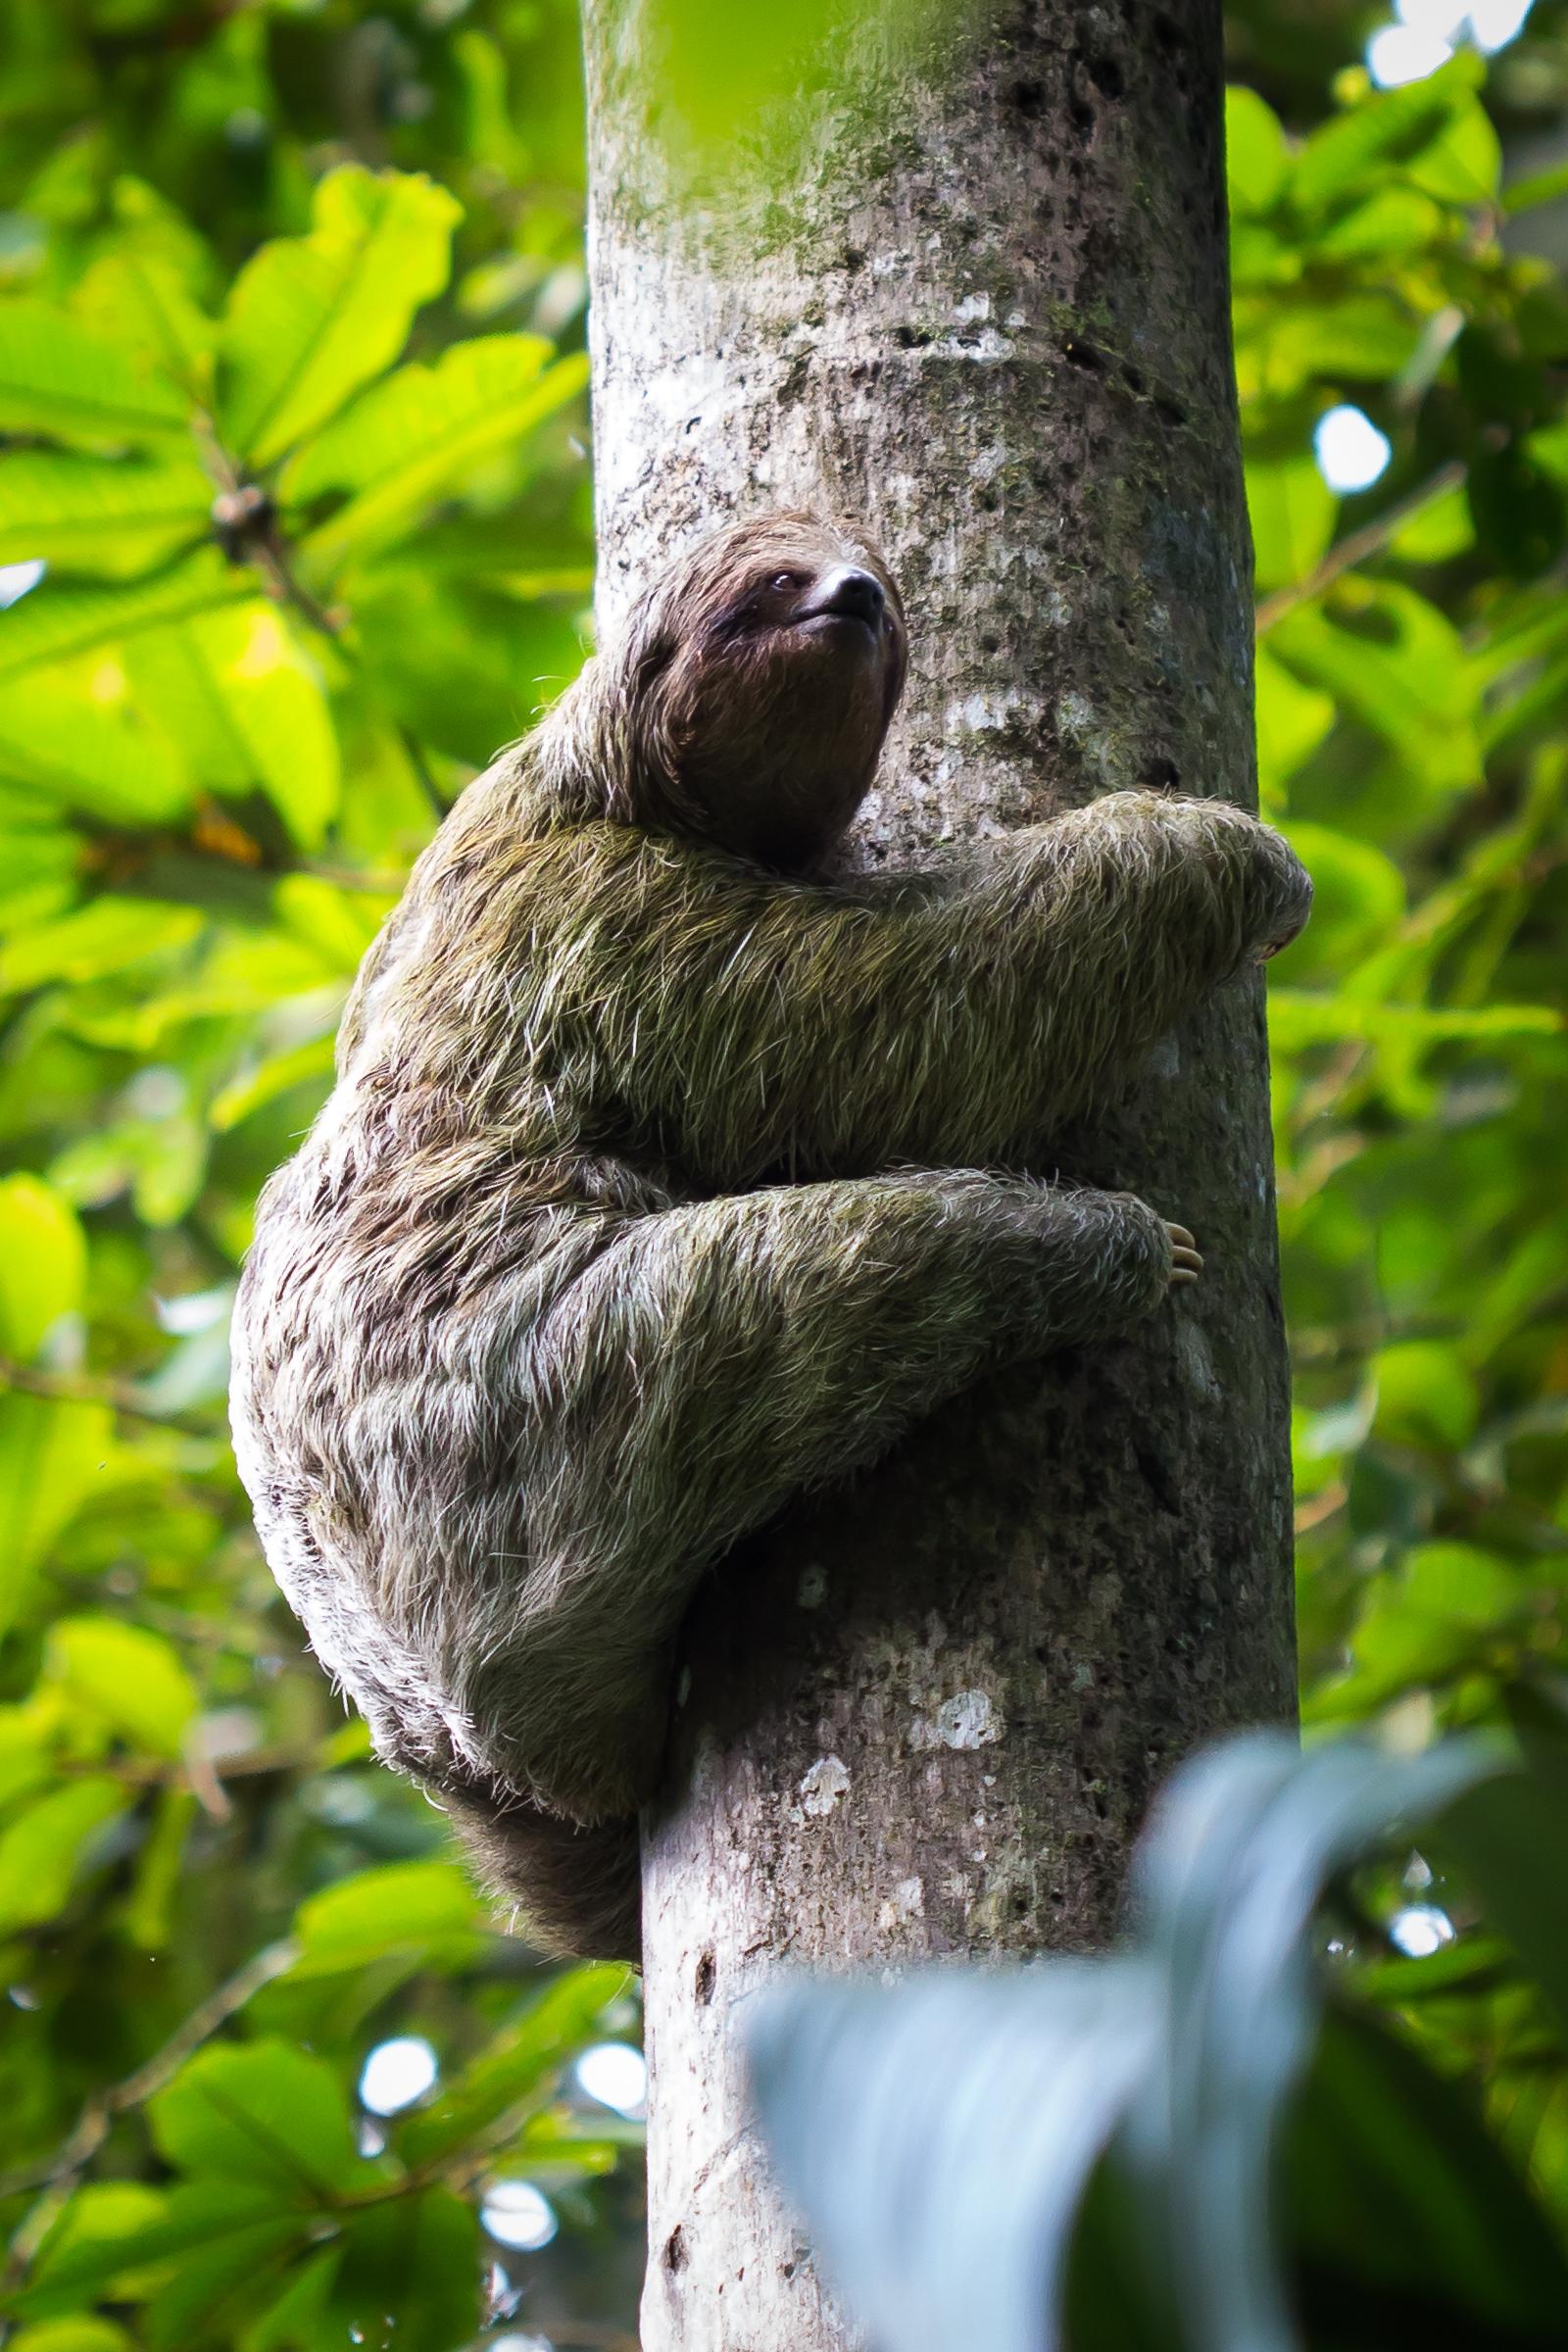 The original tree-hugger!